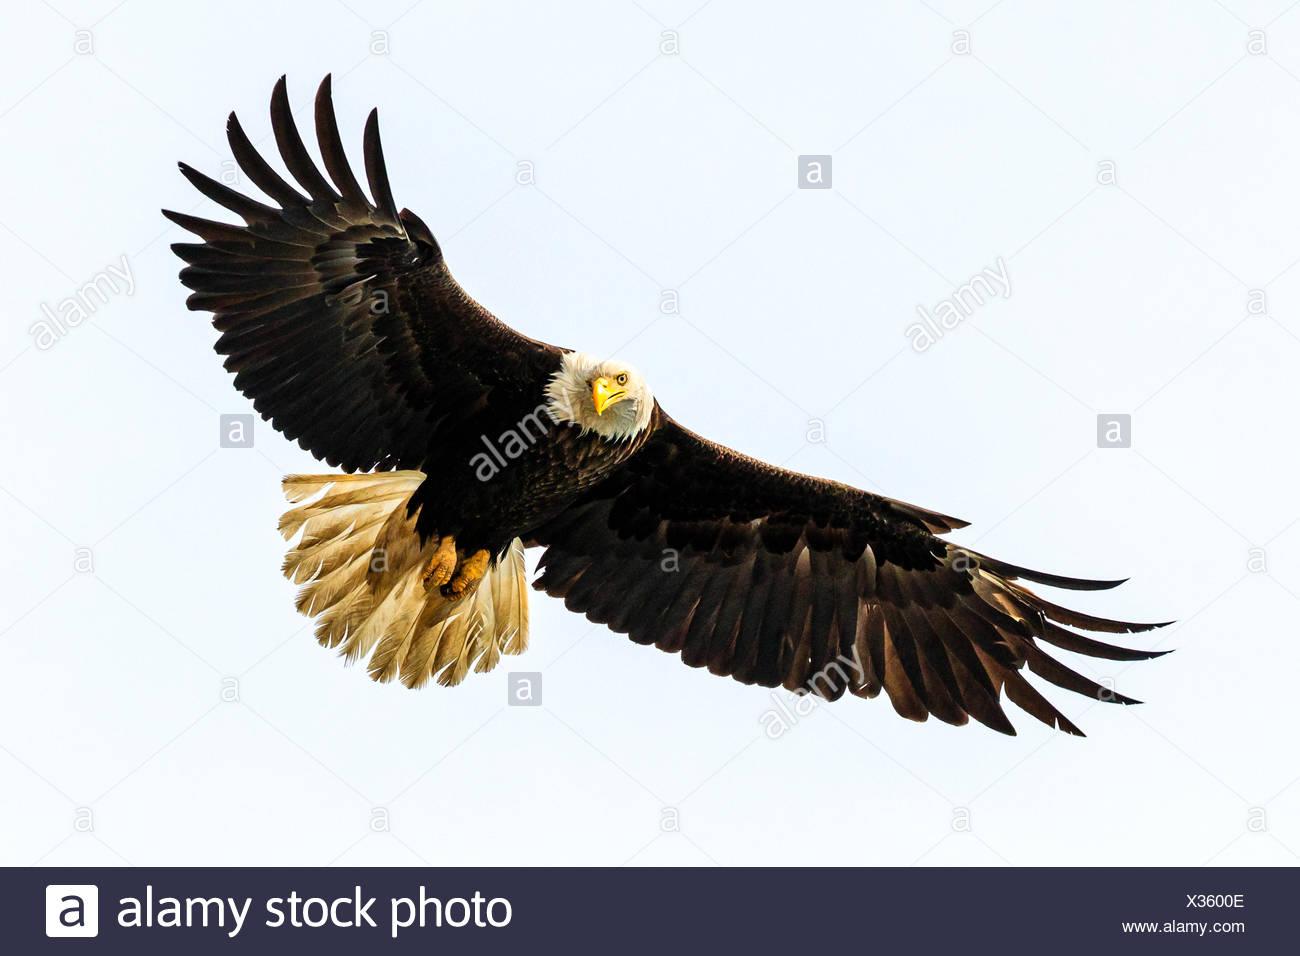 Bald Eagle, Haliaeetus leucocephalus, fishing along the shoreline in Cook Inlet, Alaska. - Stock Image